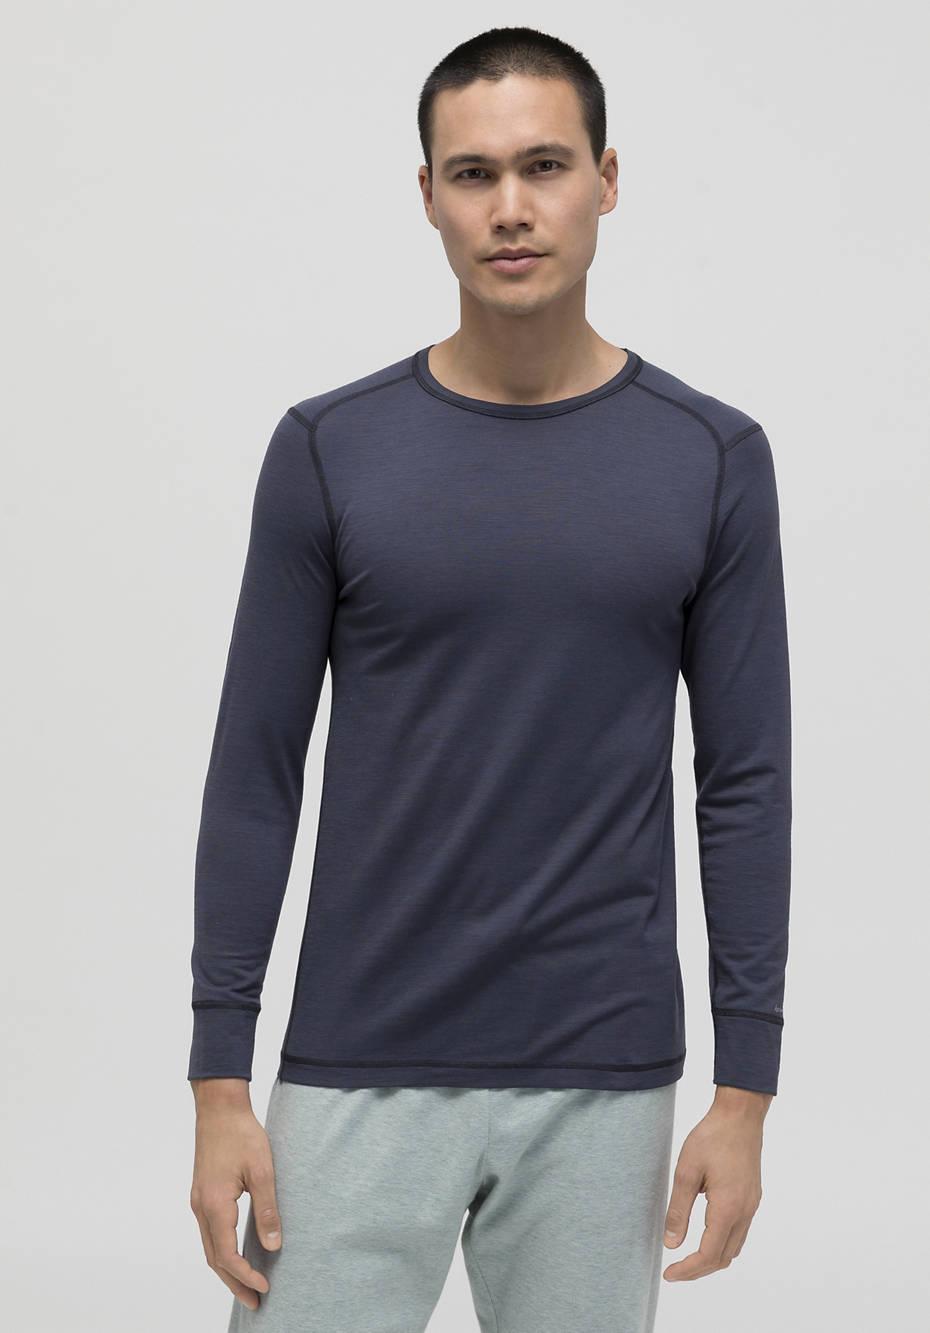 Long-sleeved shirt made of organic merino wool